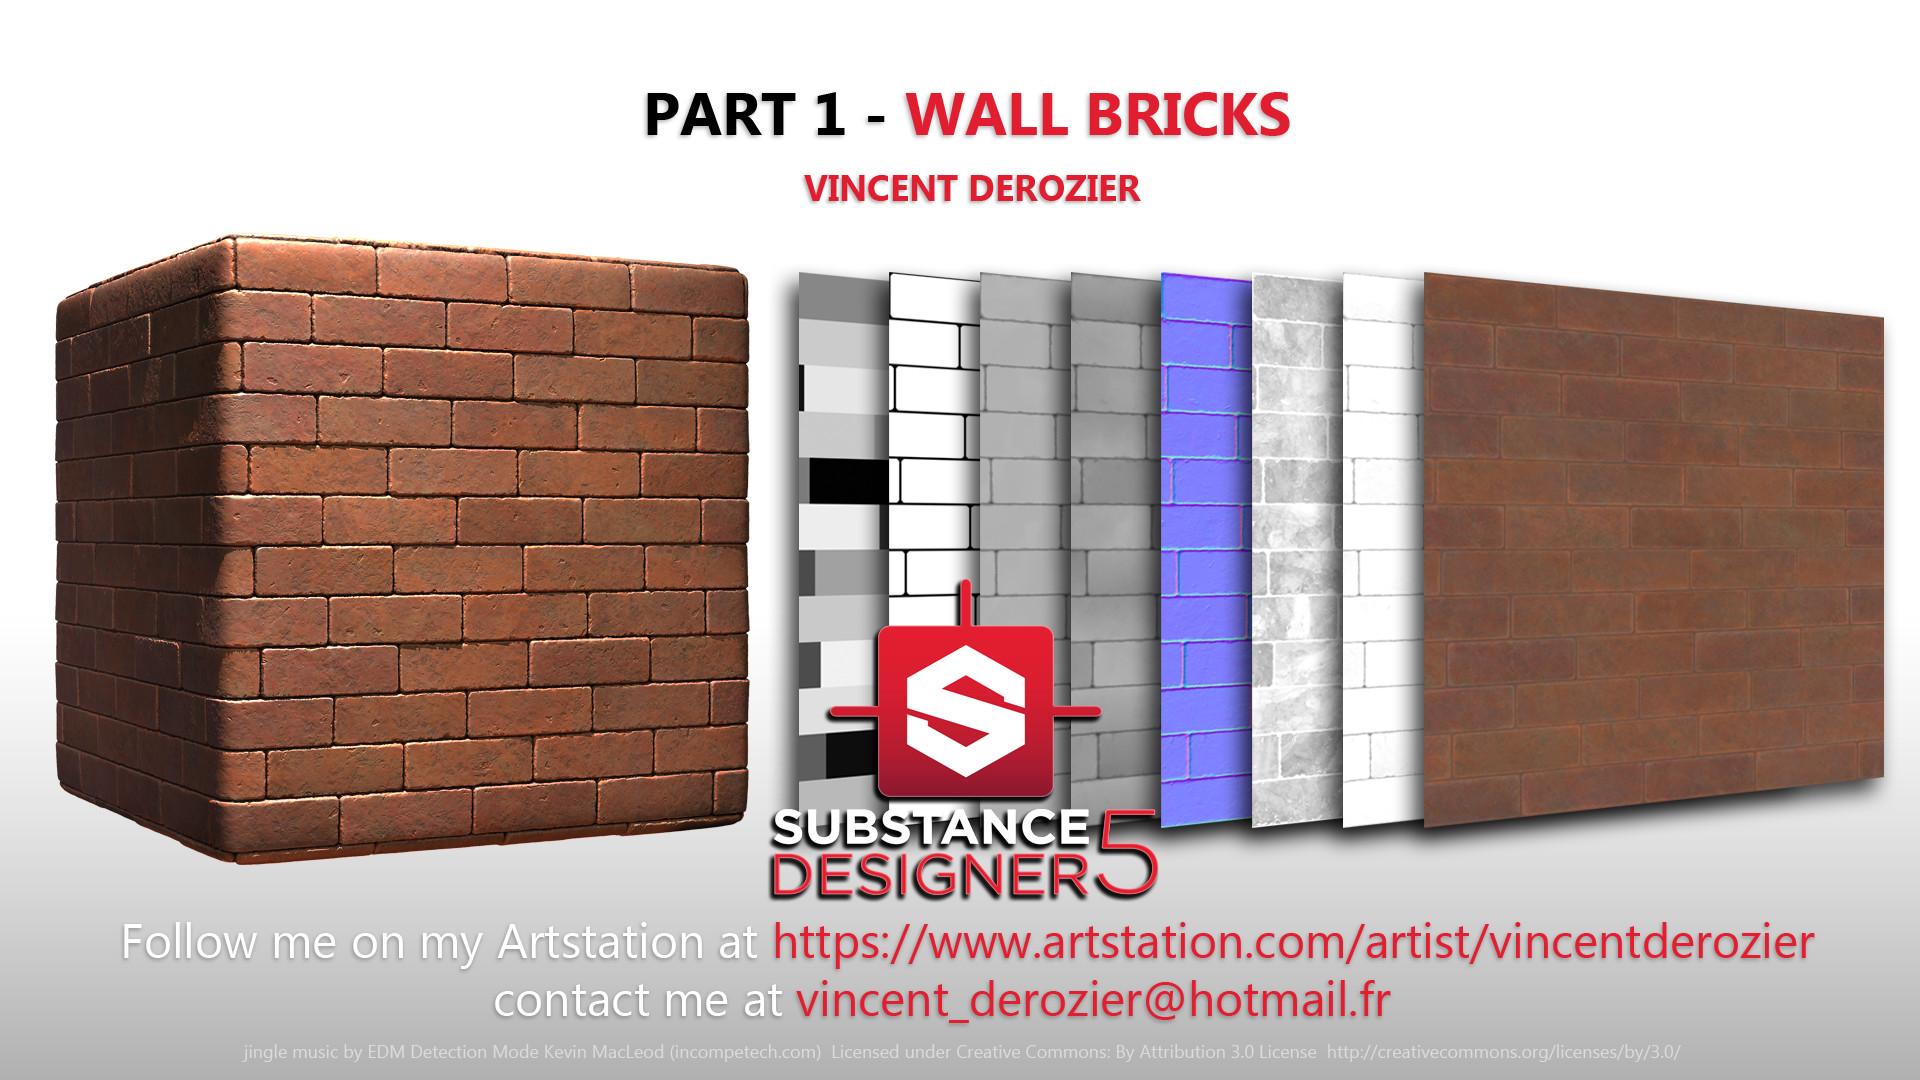 Vincent derozier part 1 wallofbricks